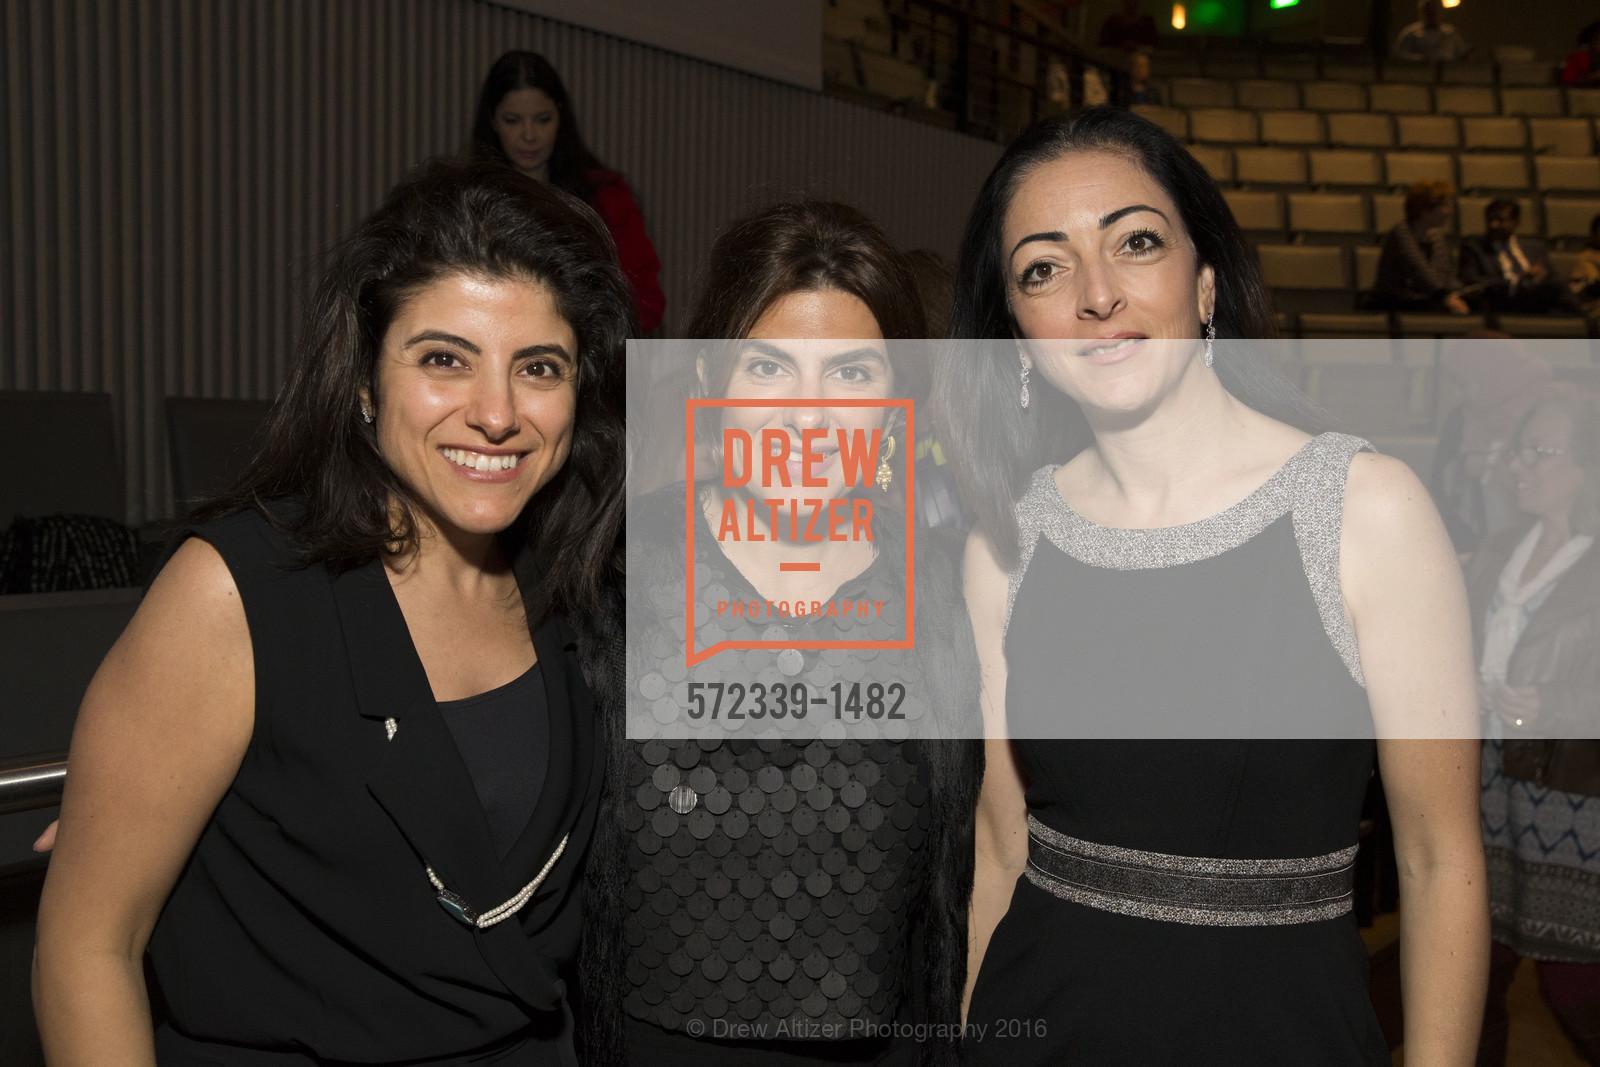 Lara Ayoub, Rima Hussieni, Noha Khatib, Photo #572339-1482